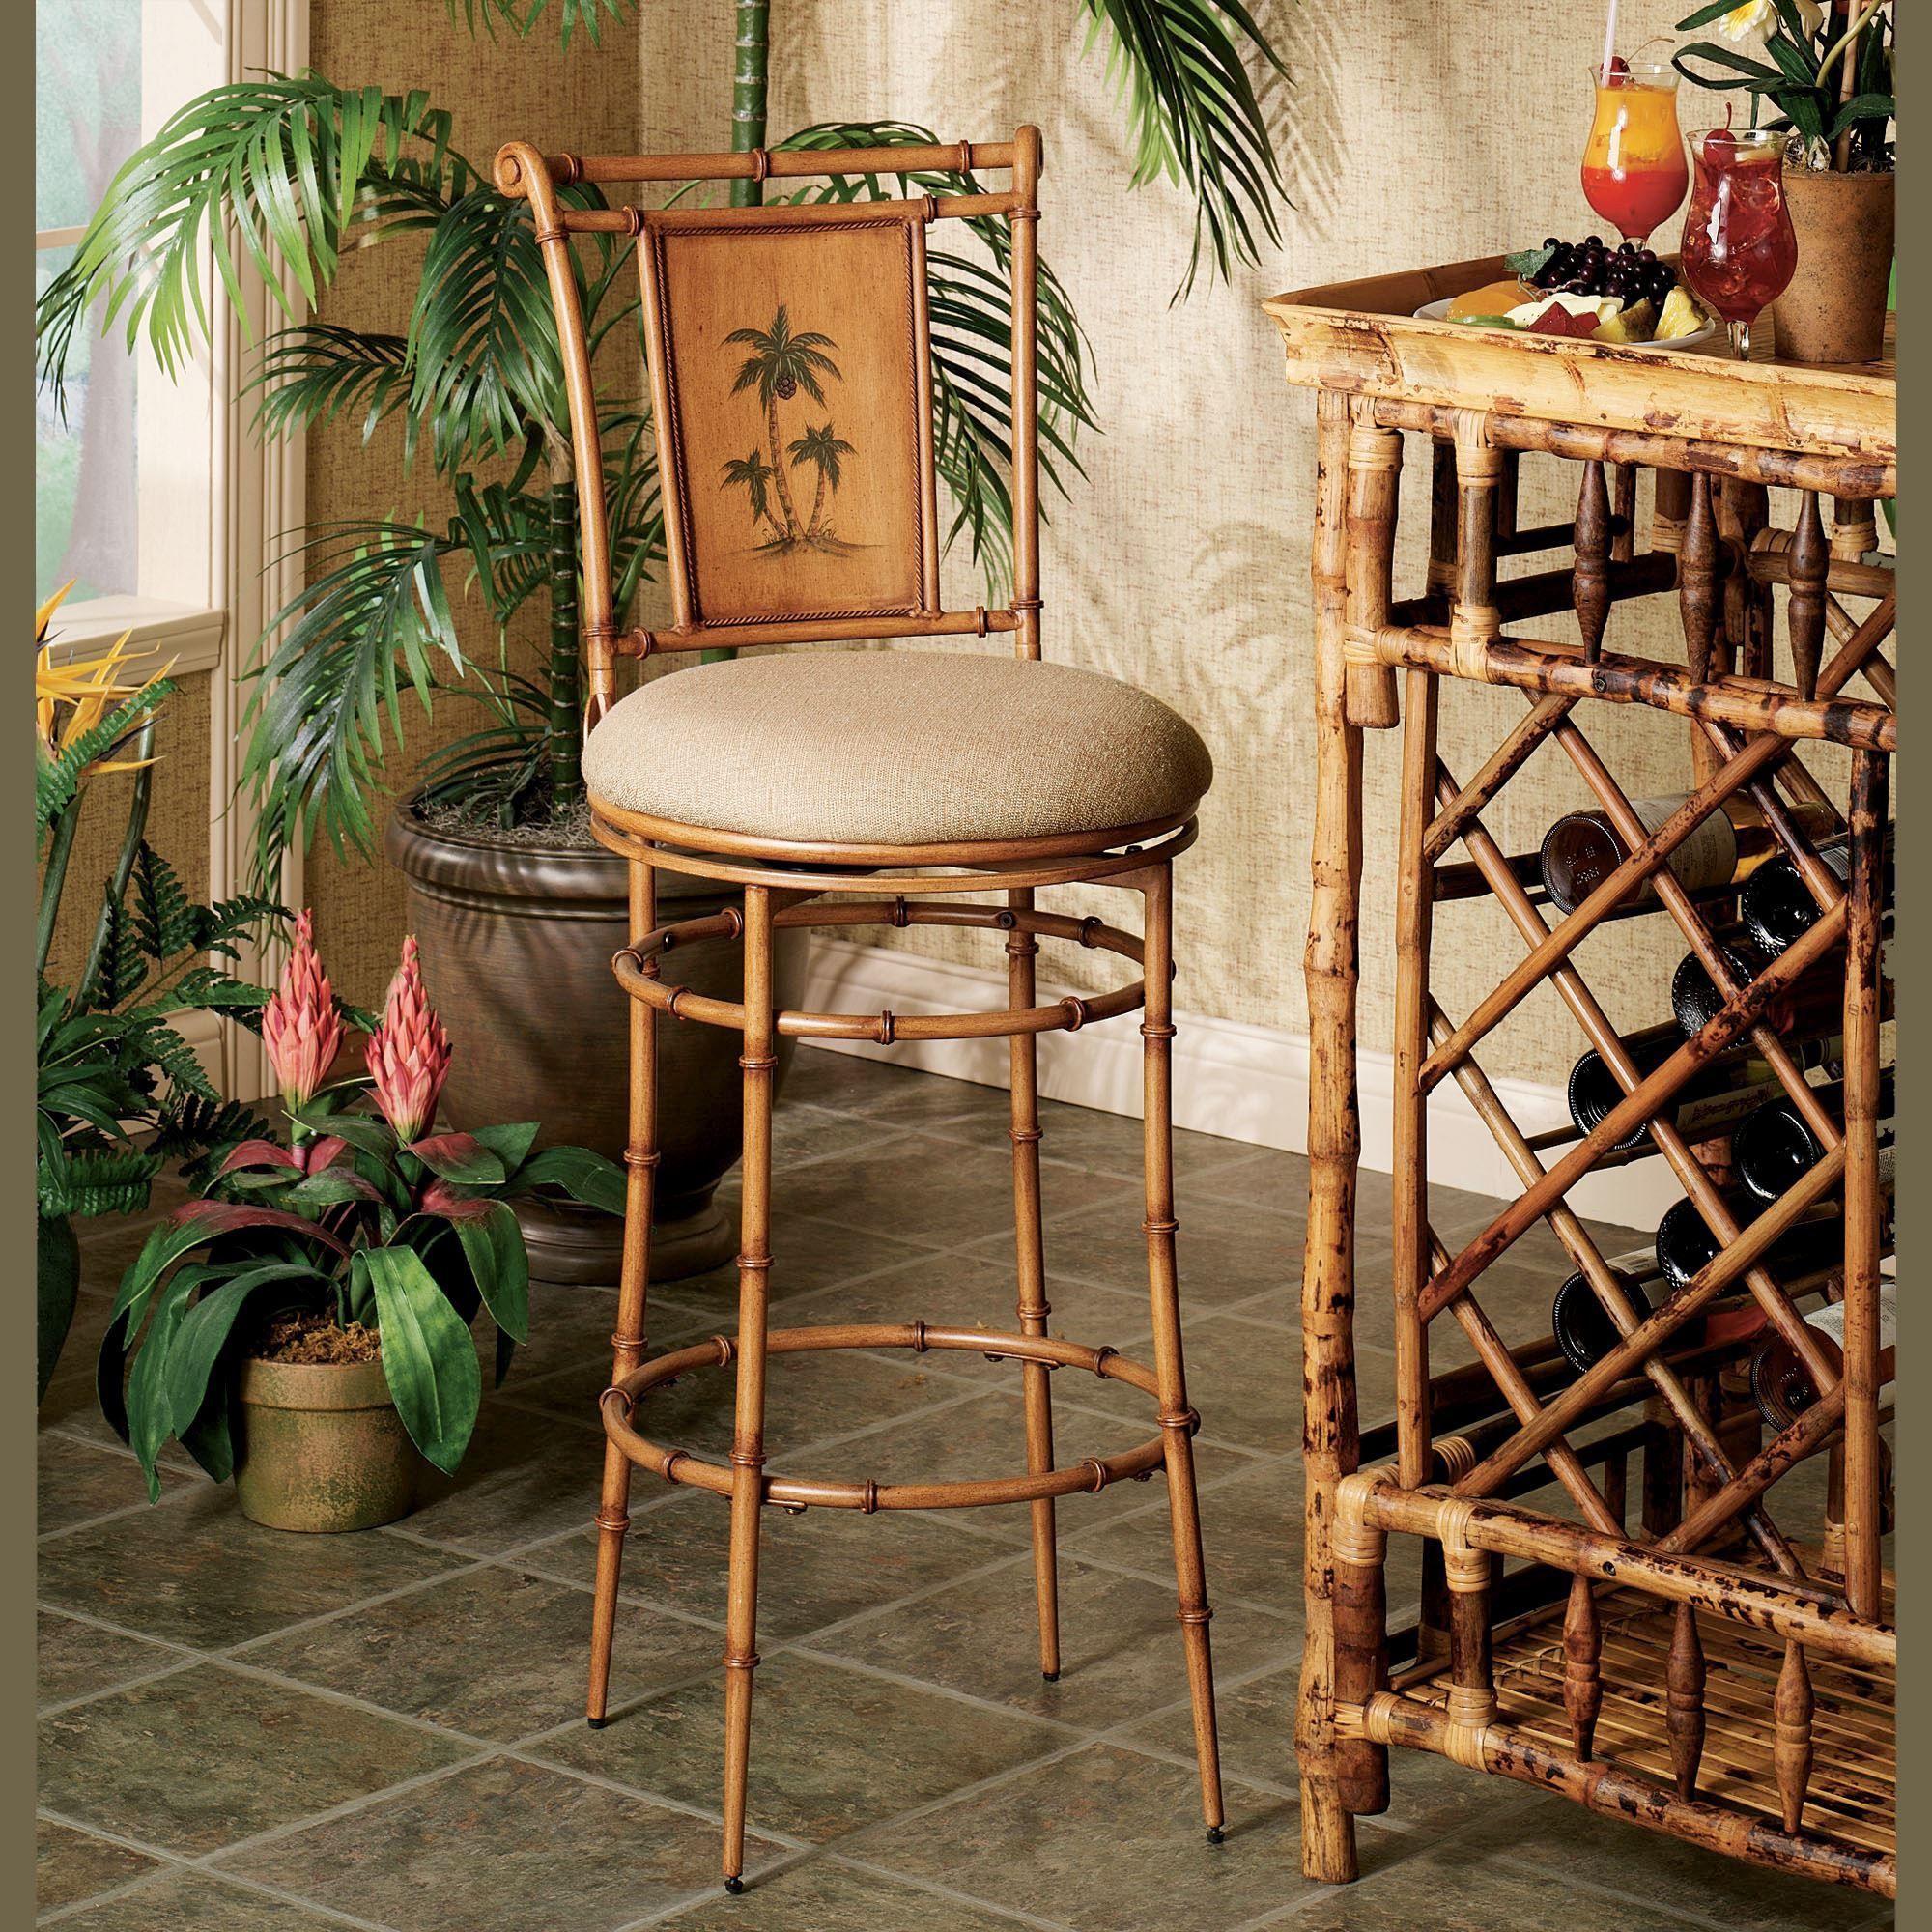 Royal Palm Tree Swivel Counter Stools